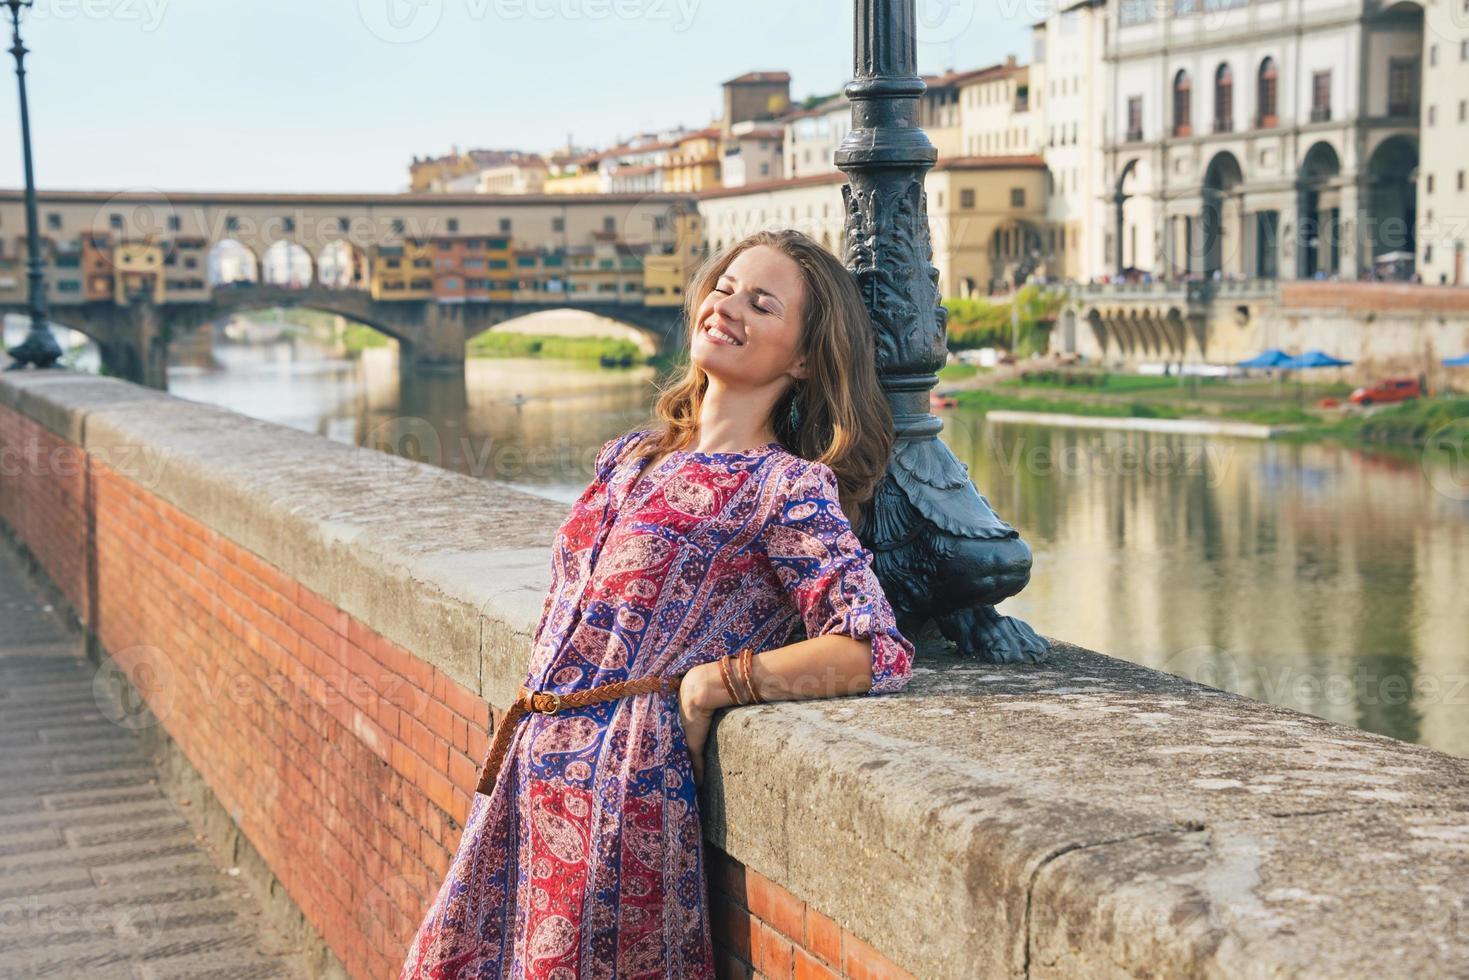 ung kvinna på vallen nära Ponte Vecchio i Florens, Italien foto